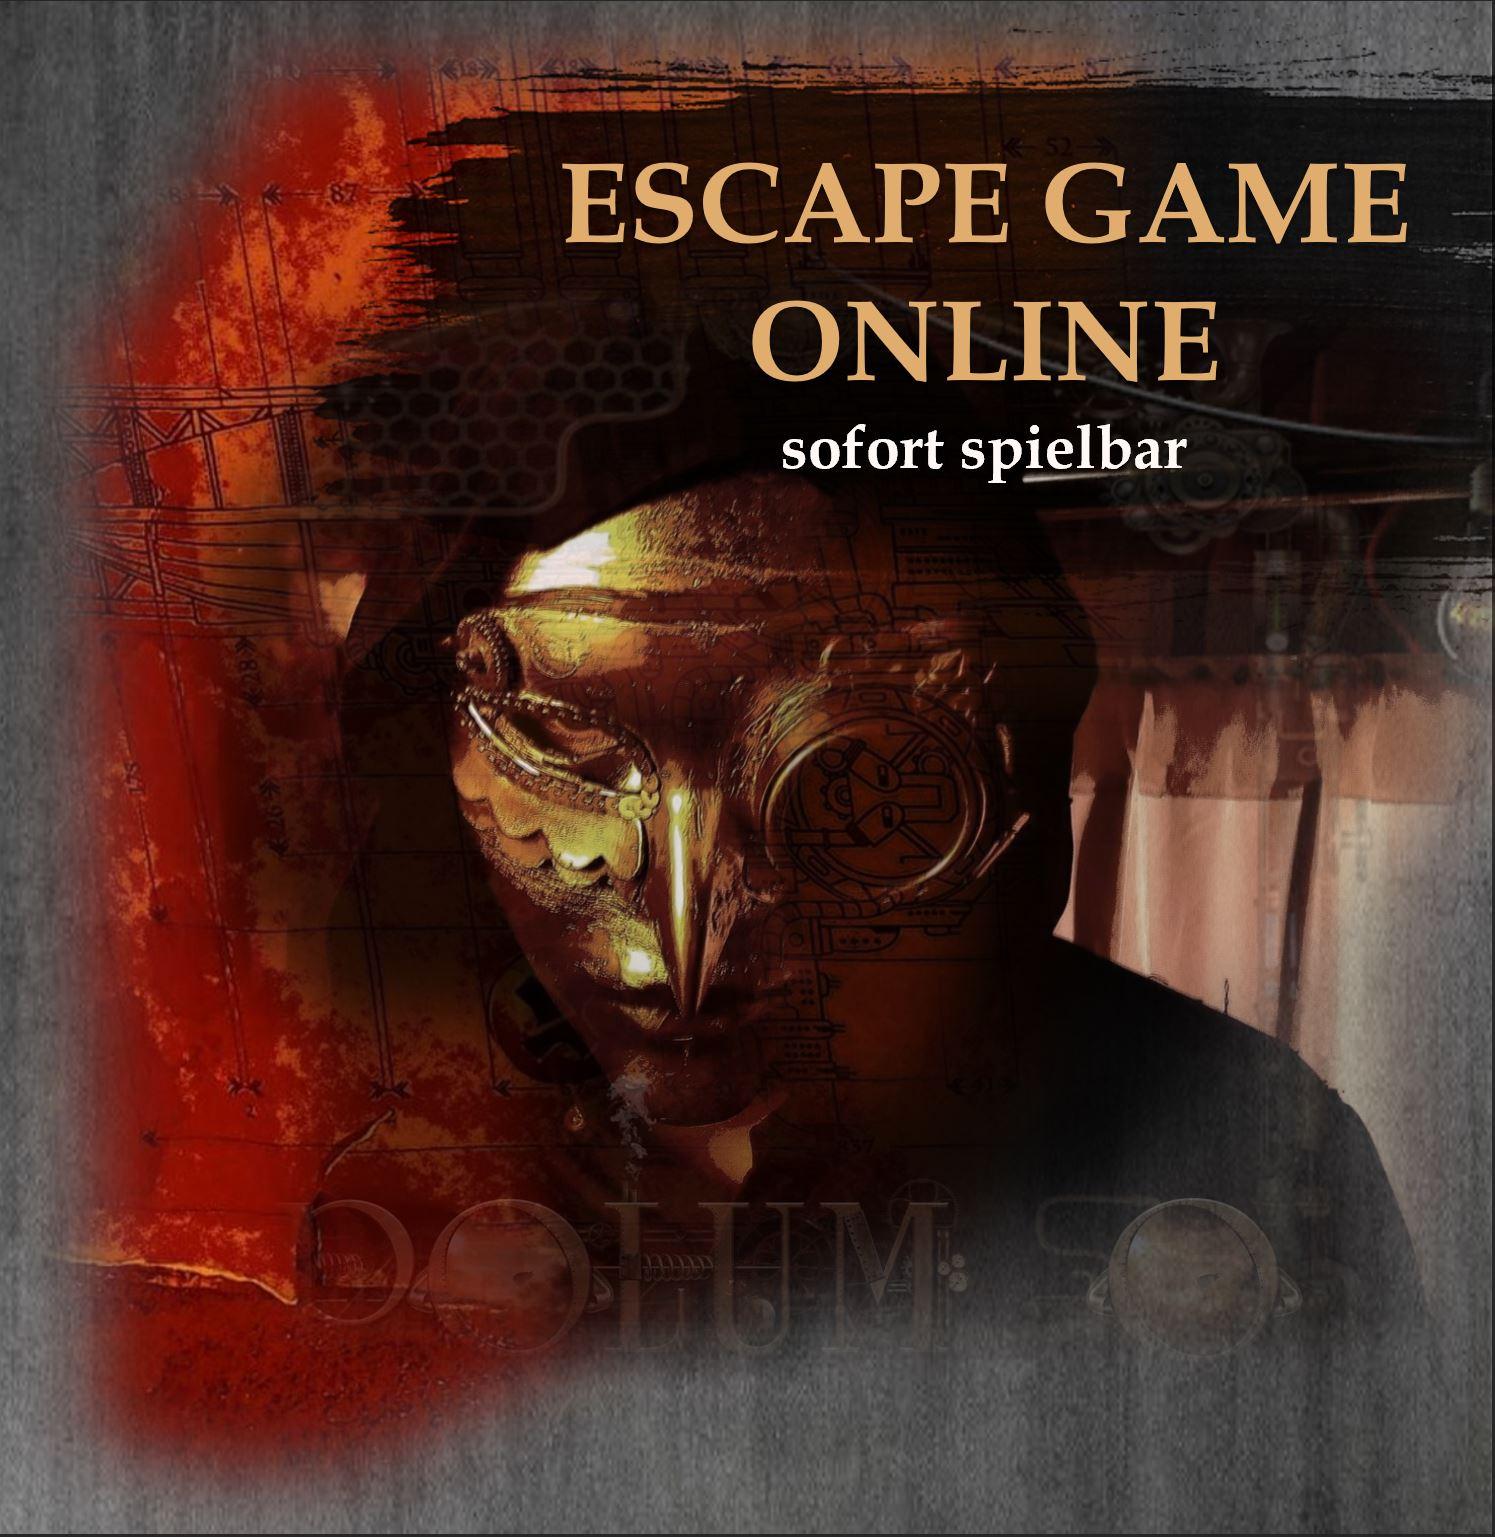 Escape Game Online Insta Post